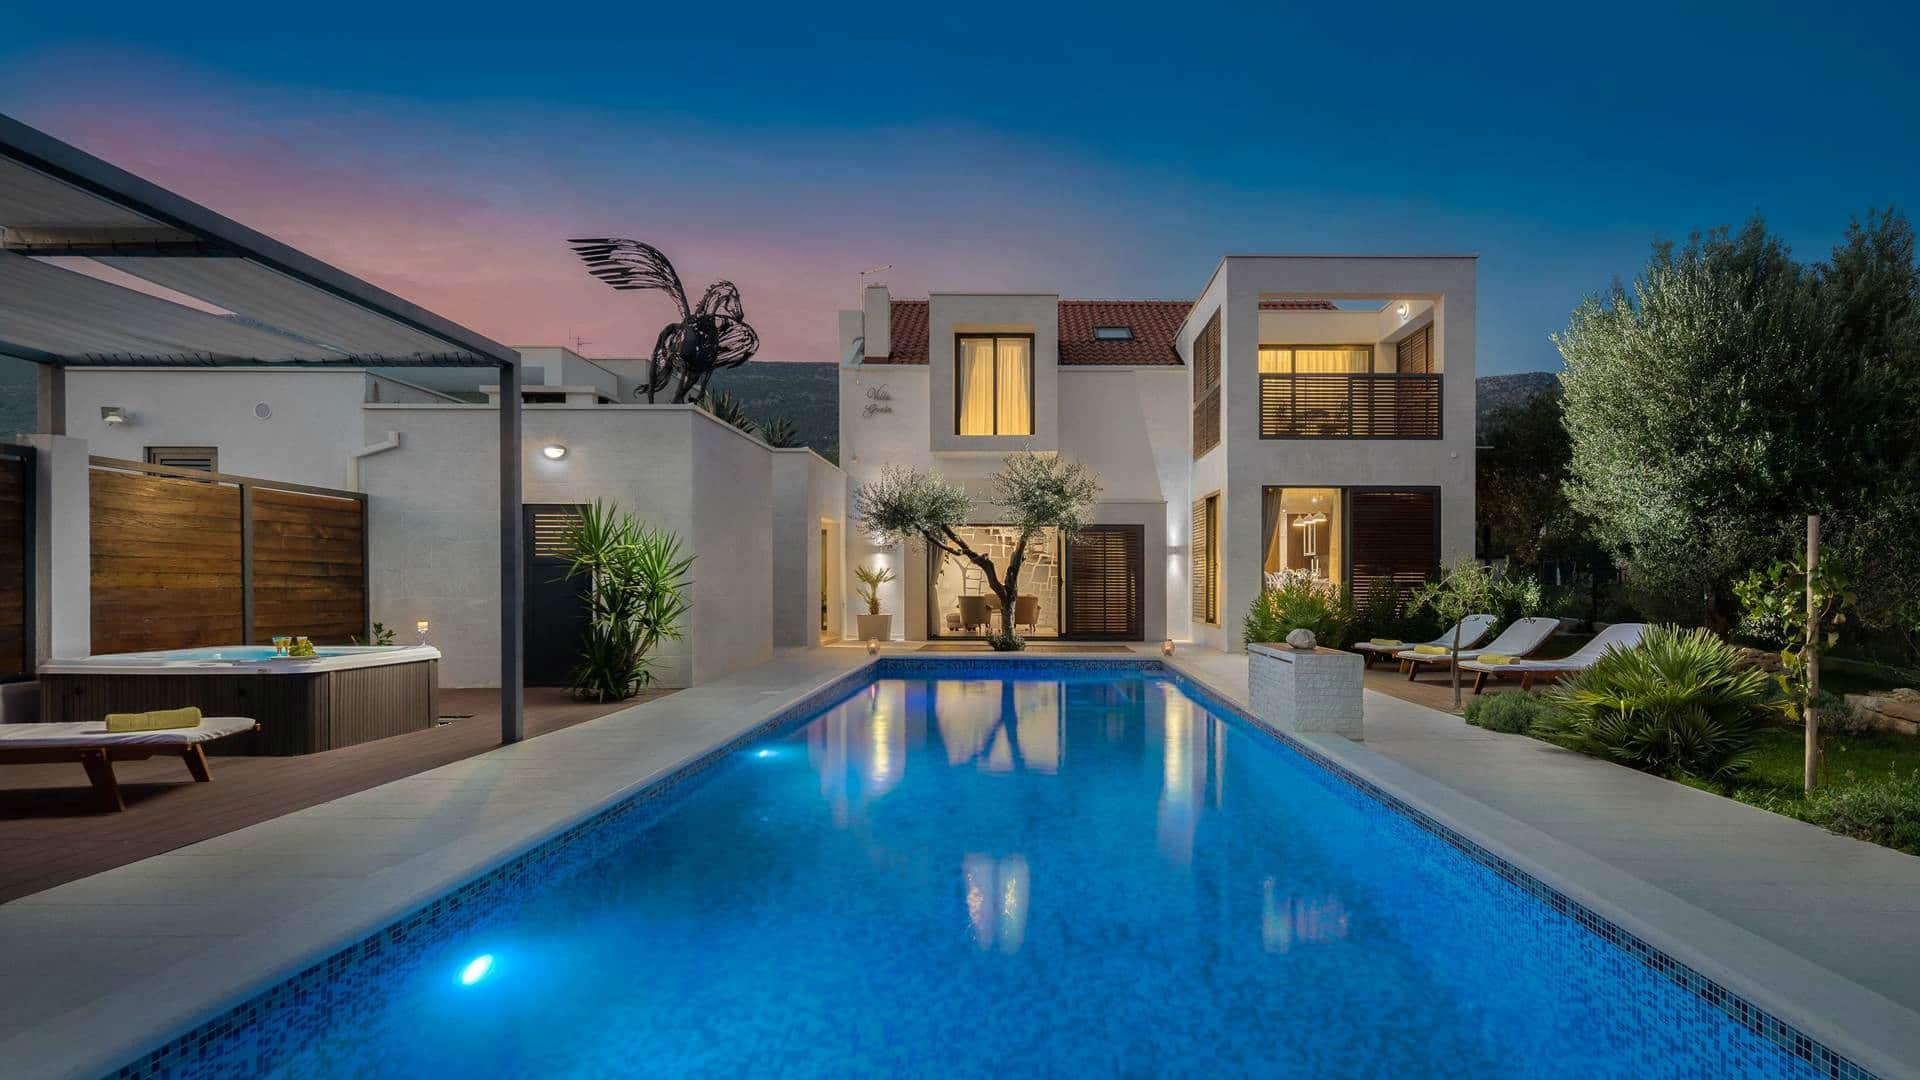 Moderna vila s bazenom i jacuzzijem